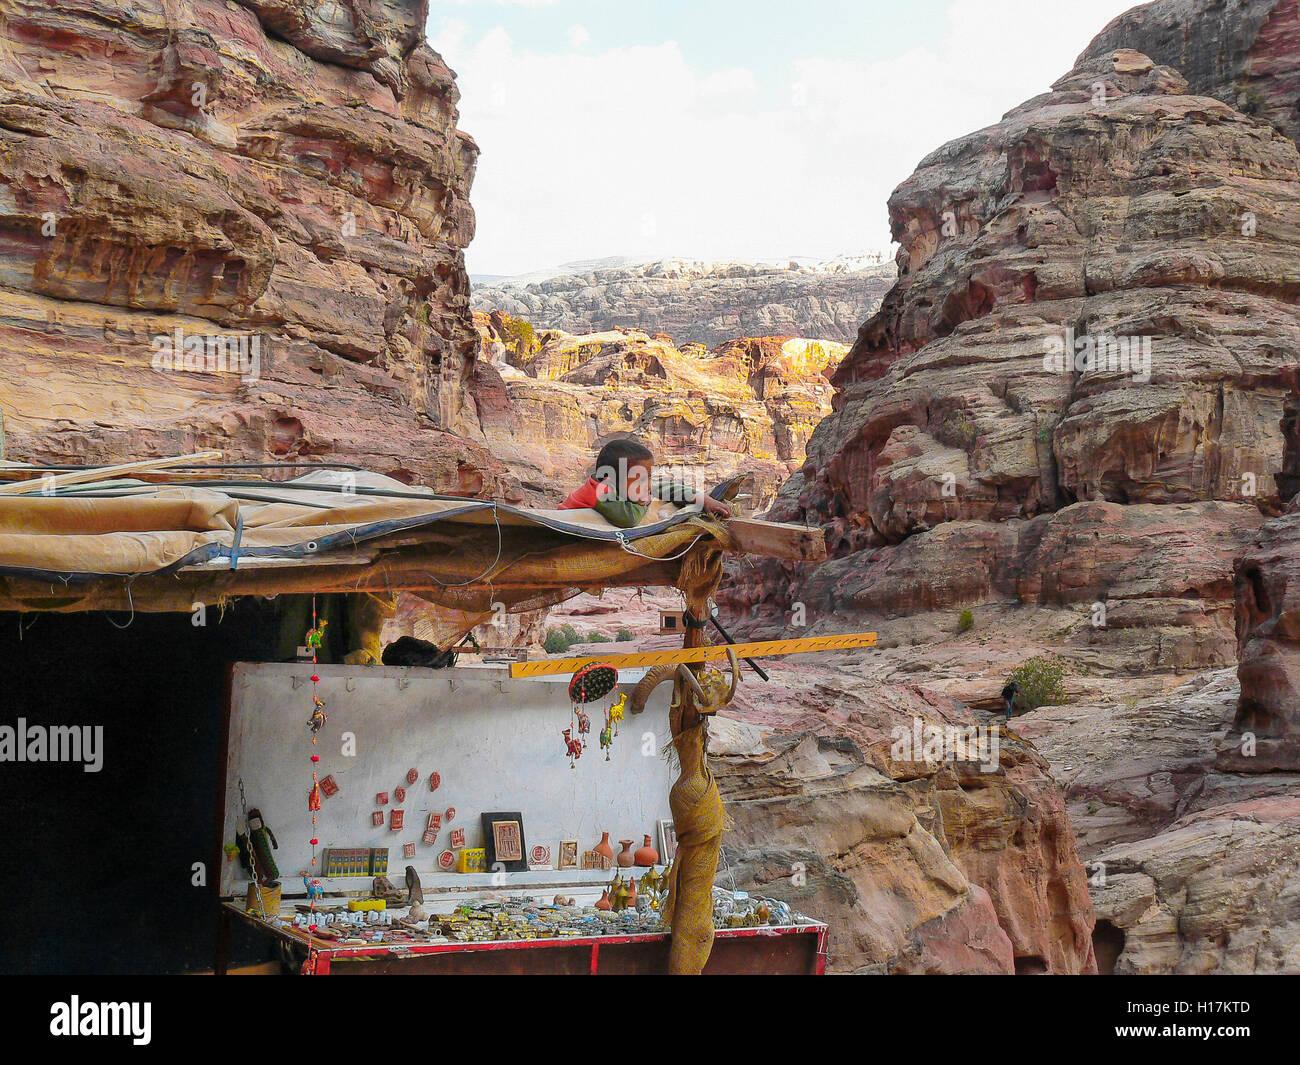 Souvenir-Stand auf Petra, Jordanien Stockbild